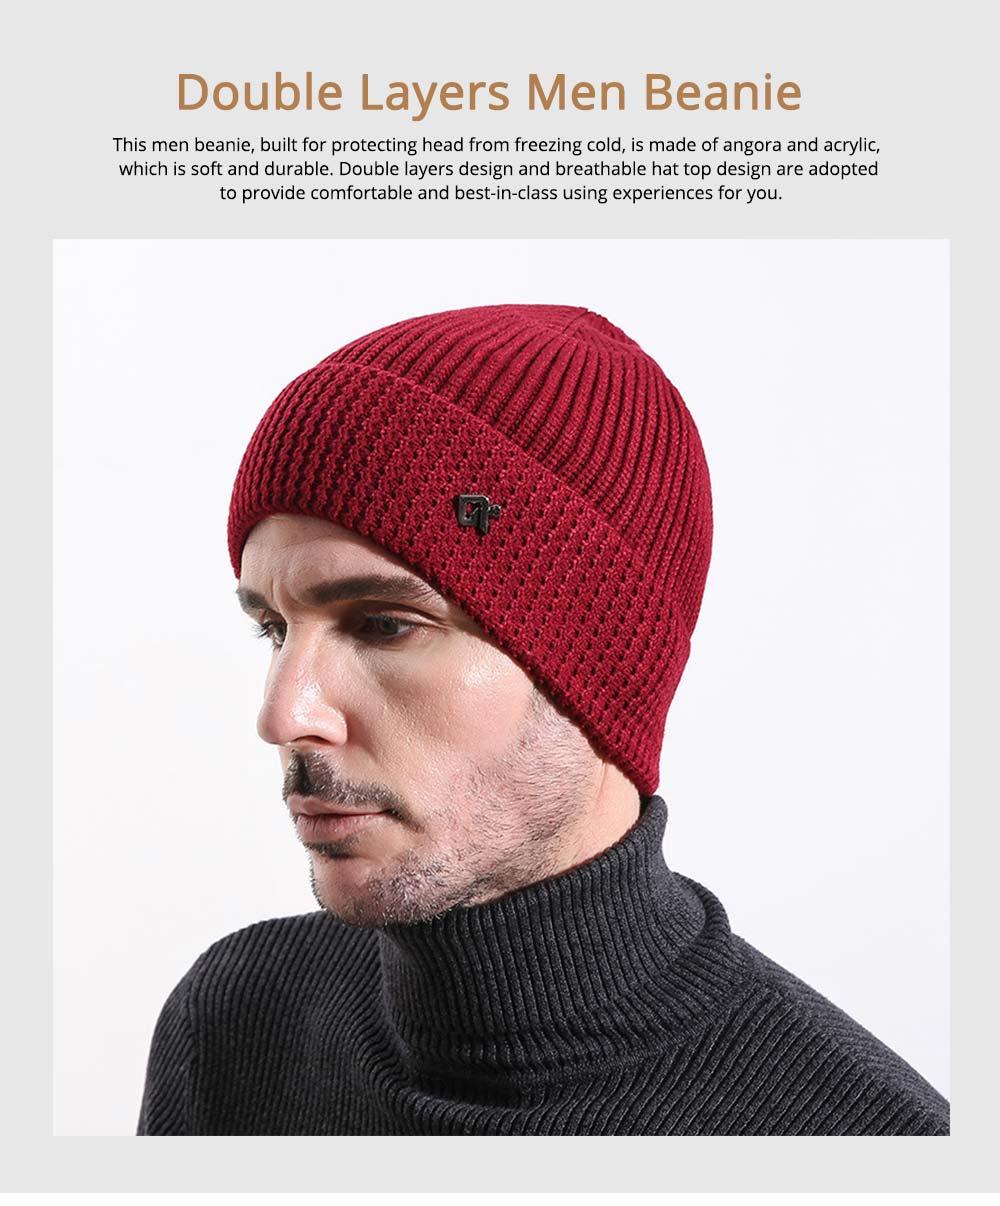 Ultra-soft Warm Thicken Angora Men Beanie, Minimalist Double-layers Winter Autumn Knitted Cap Hat 0